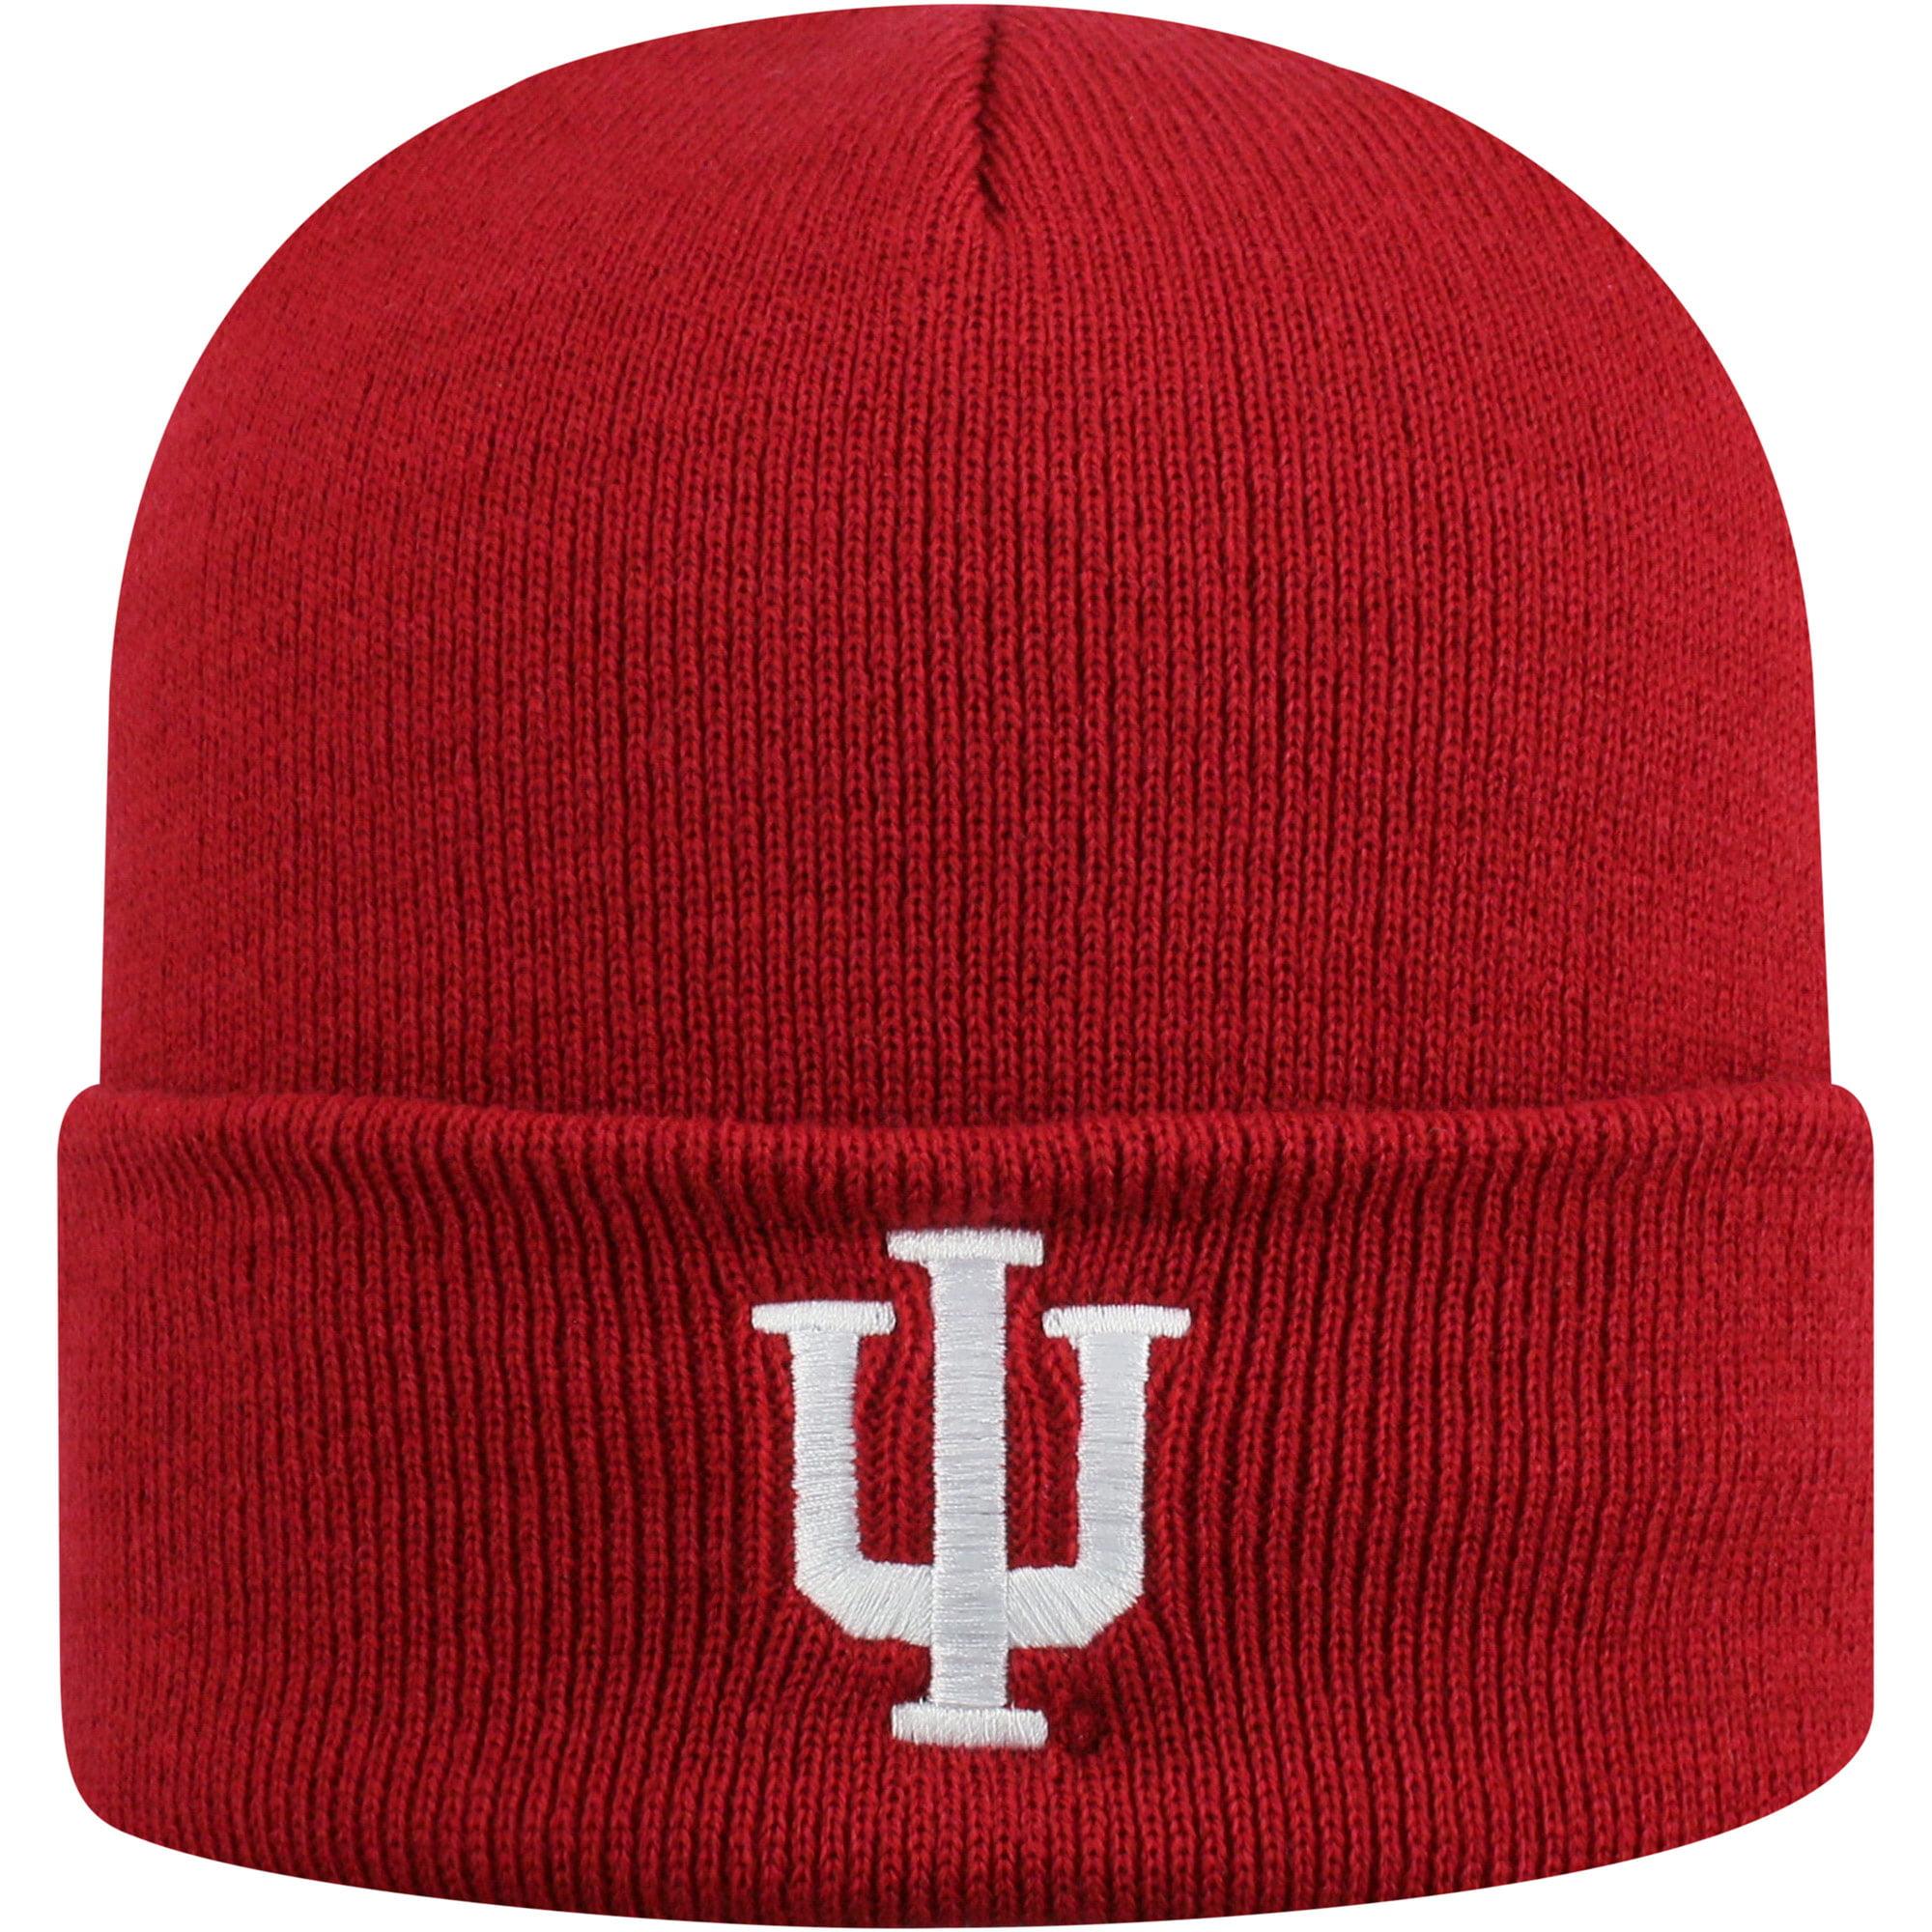 Men's Russell Crimson Indiana Hoosiers Team Cuffed Knit Hat - OSFA